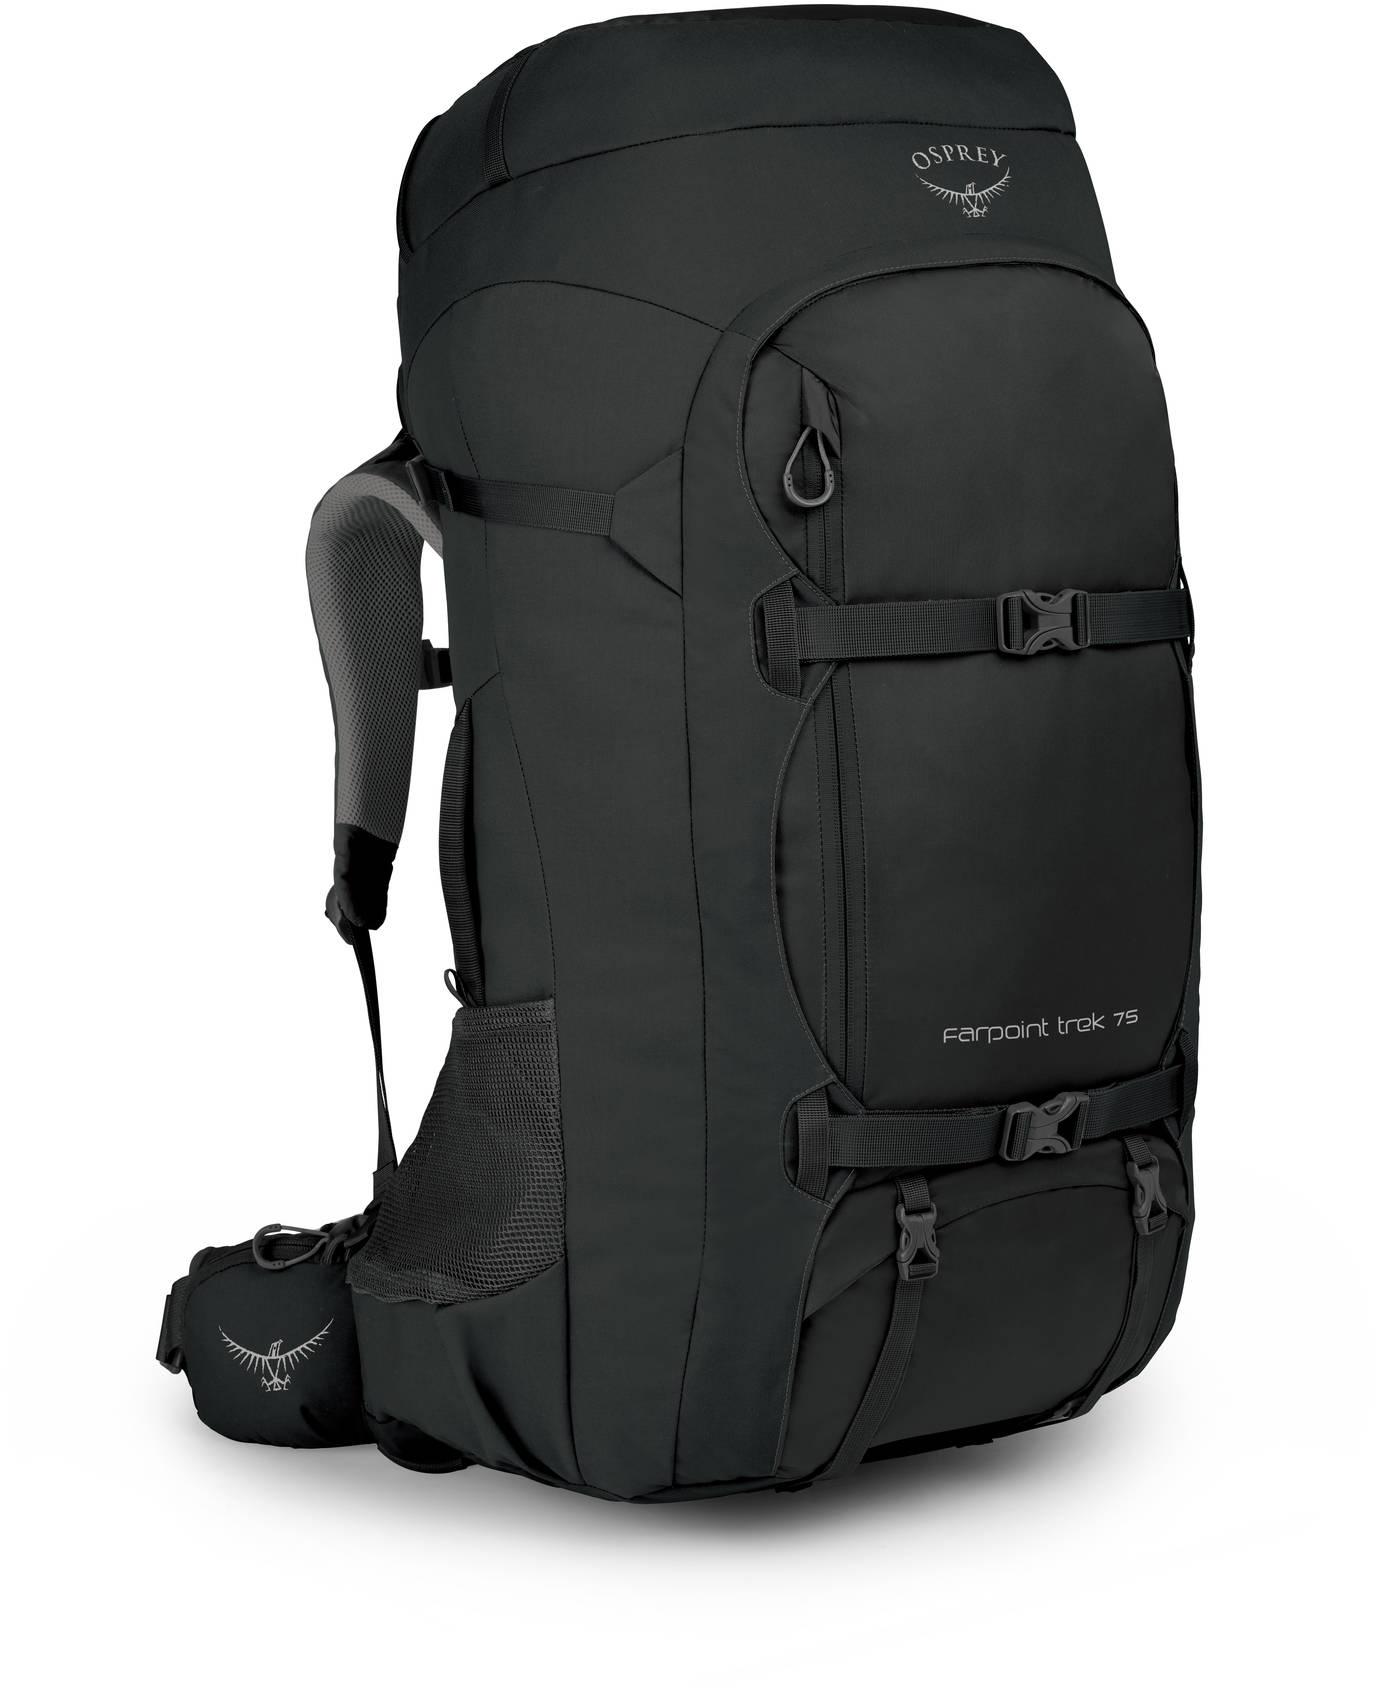 Туристические рюкзаки Рюкзак для путешествий Osprey Farpoint Trek 75 Black Farpoint_Trek_75_F19_Side_Black_web.jpg